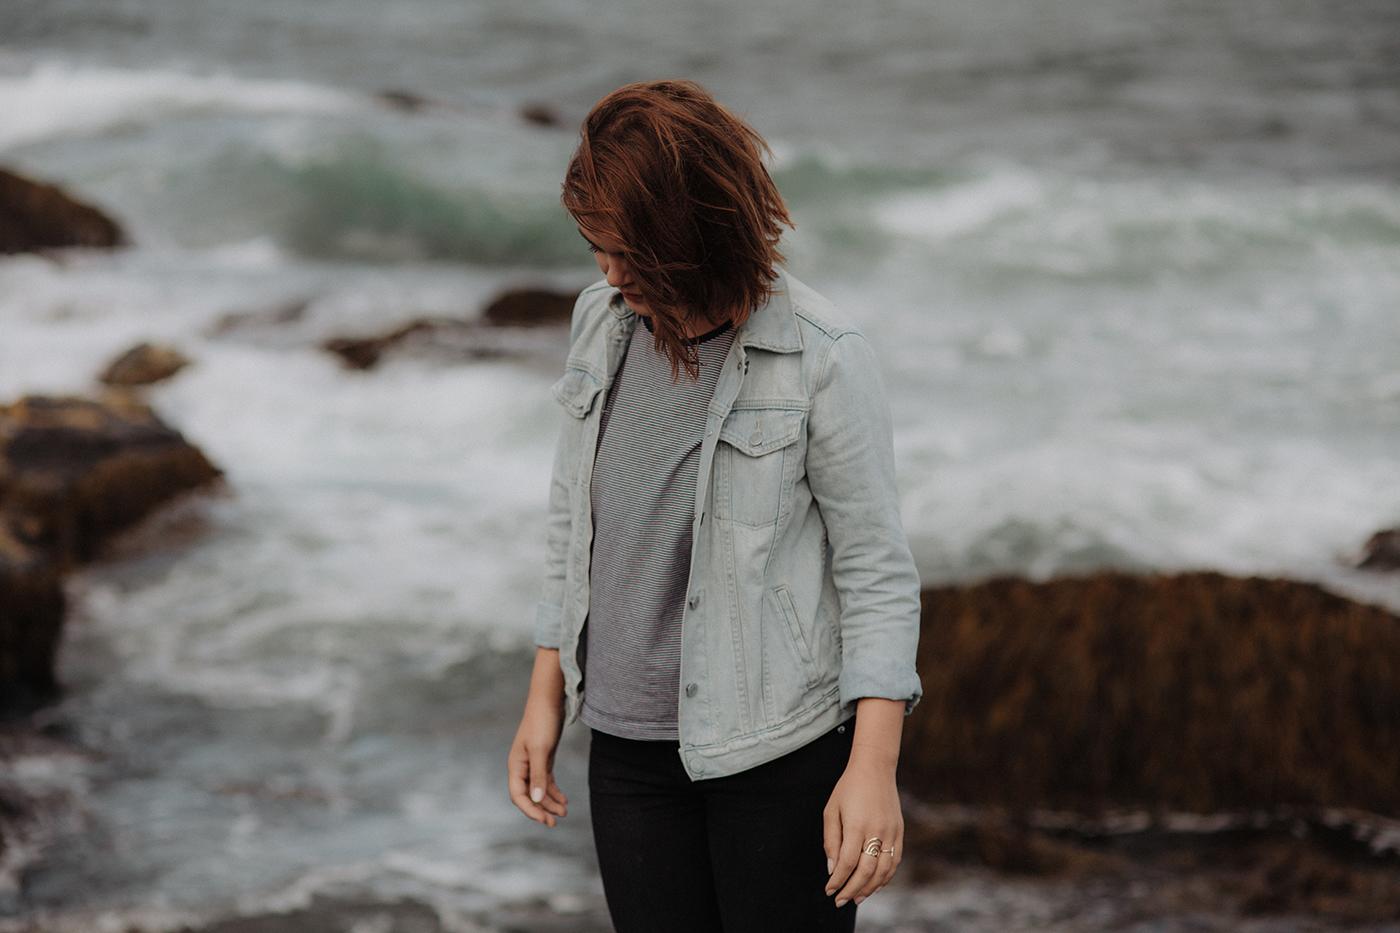 ogunquit_maine_beach_portraits-2.jpg